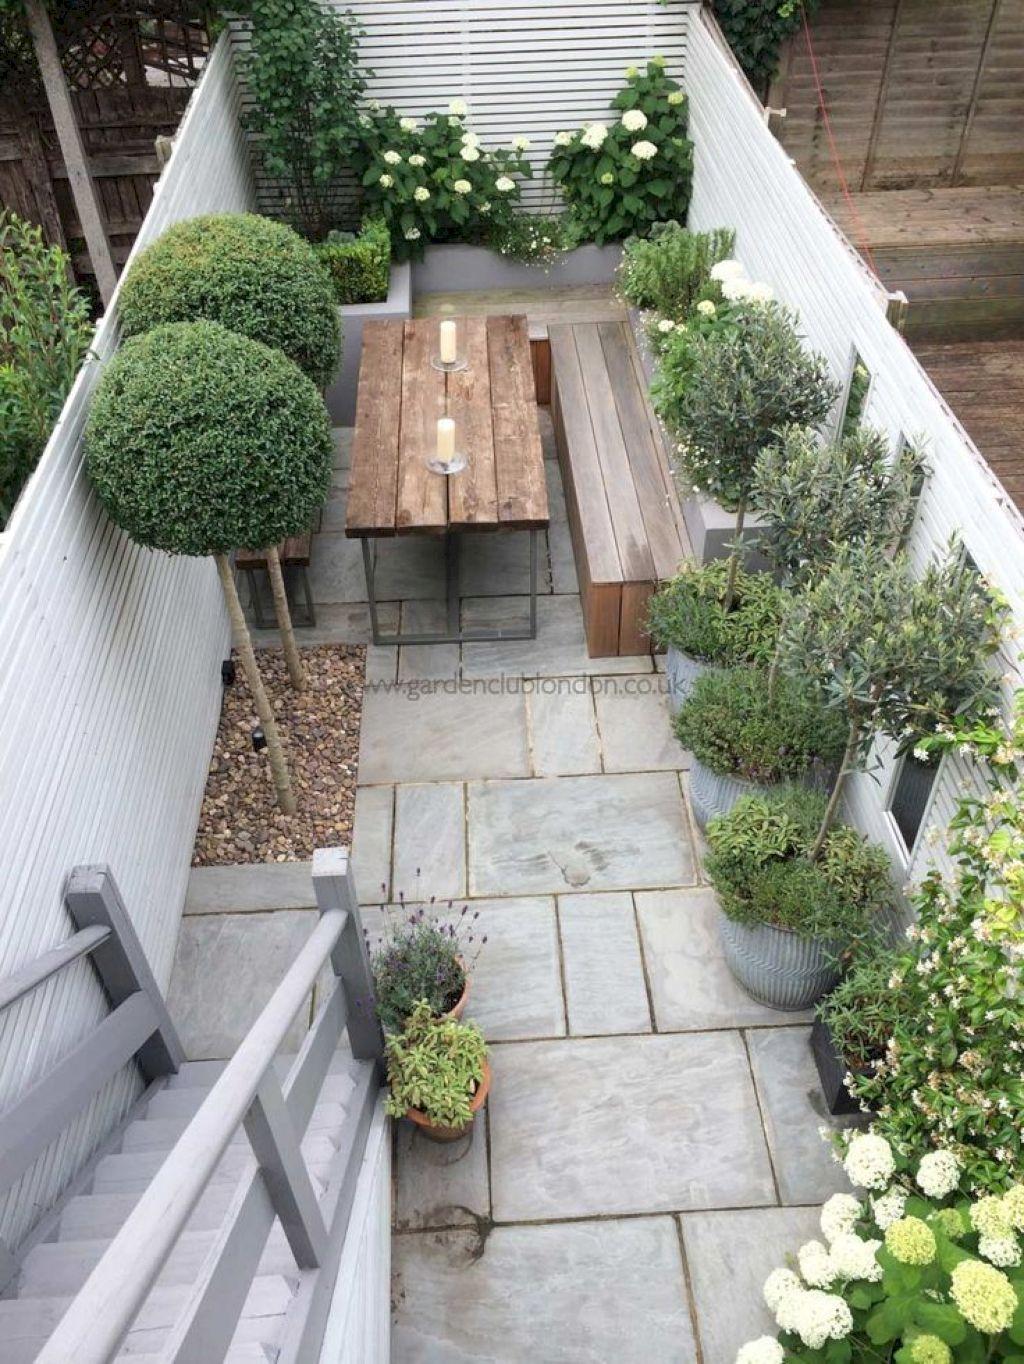 In home garden ideas   Modern Backyard Landscaping Remodel Ideas  Home  Terasse